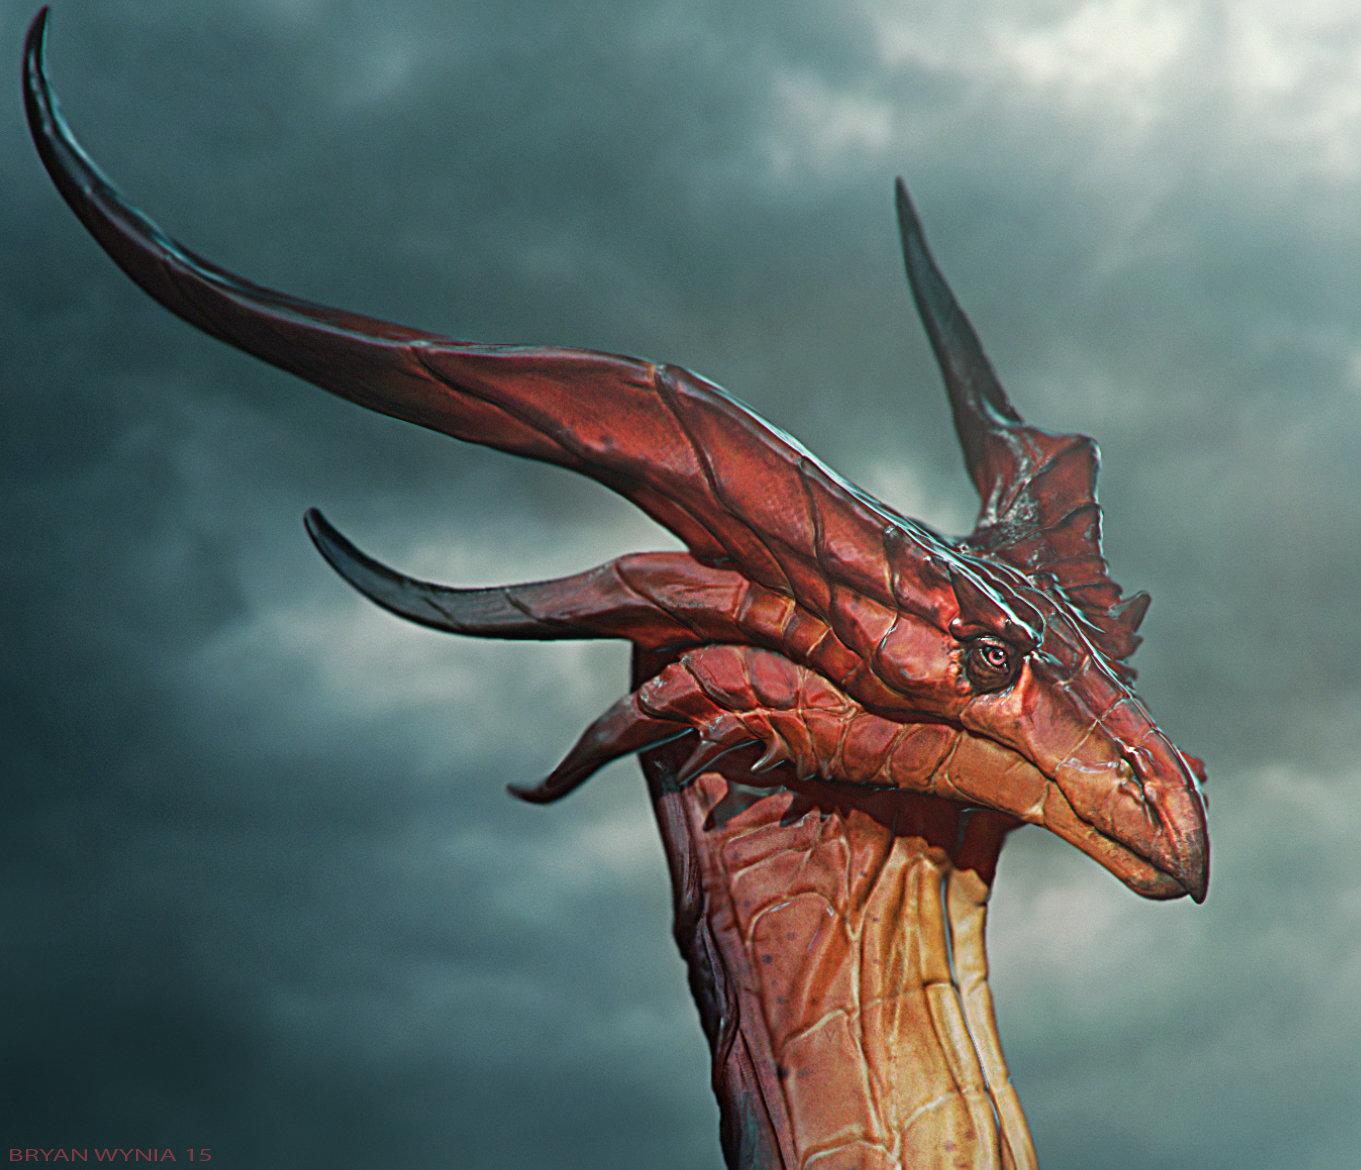 Cryptcreeper dragon 1 08a925c6 xzze